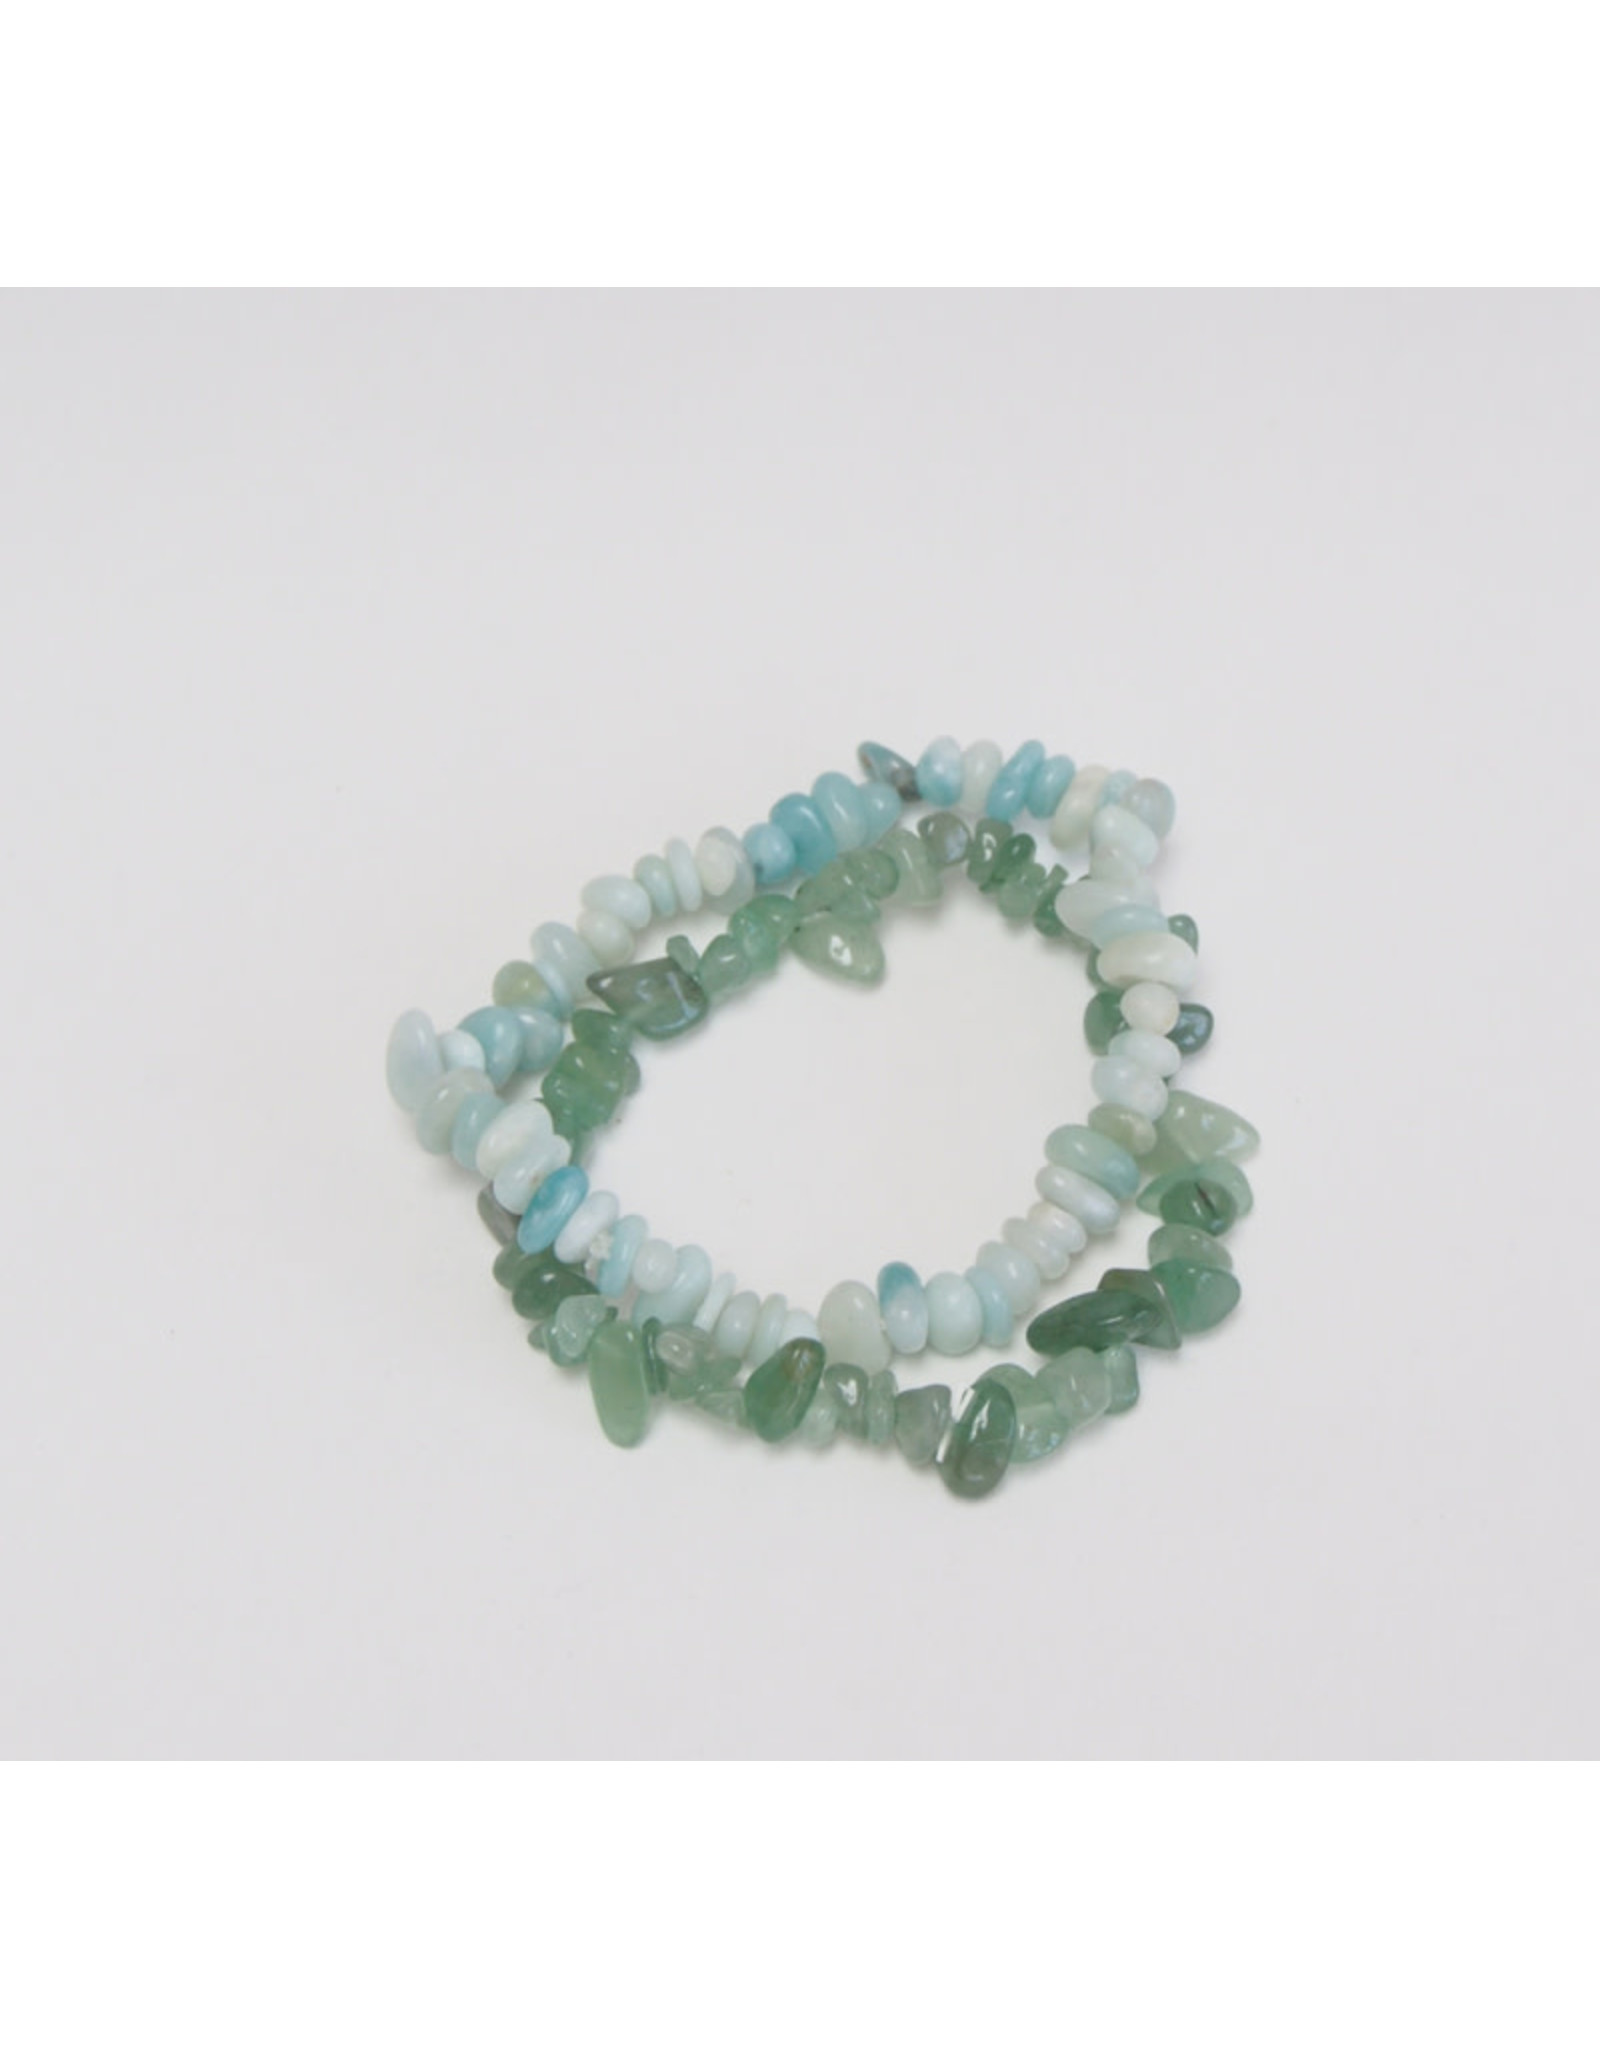 Rockstyle Bracelets - Aventurine & Amazonite